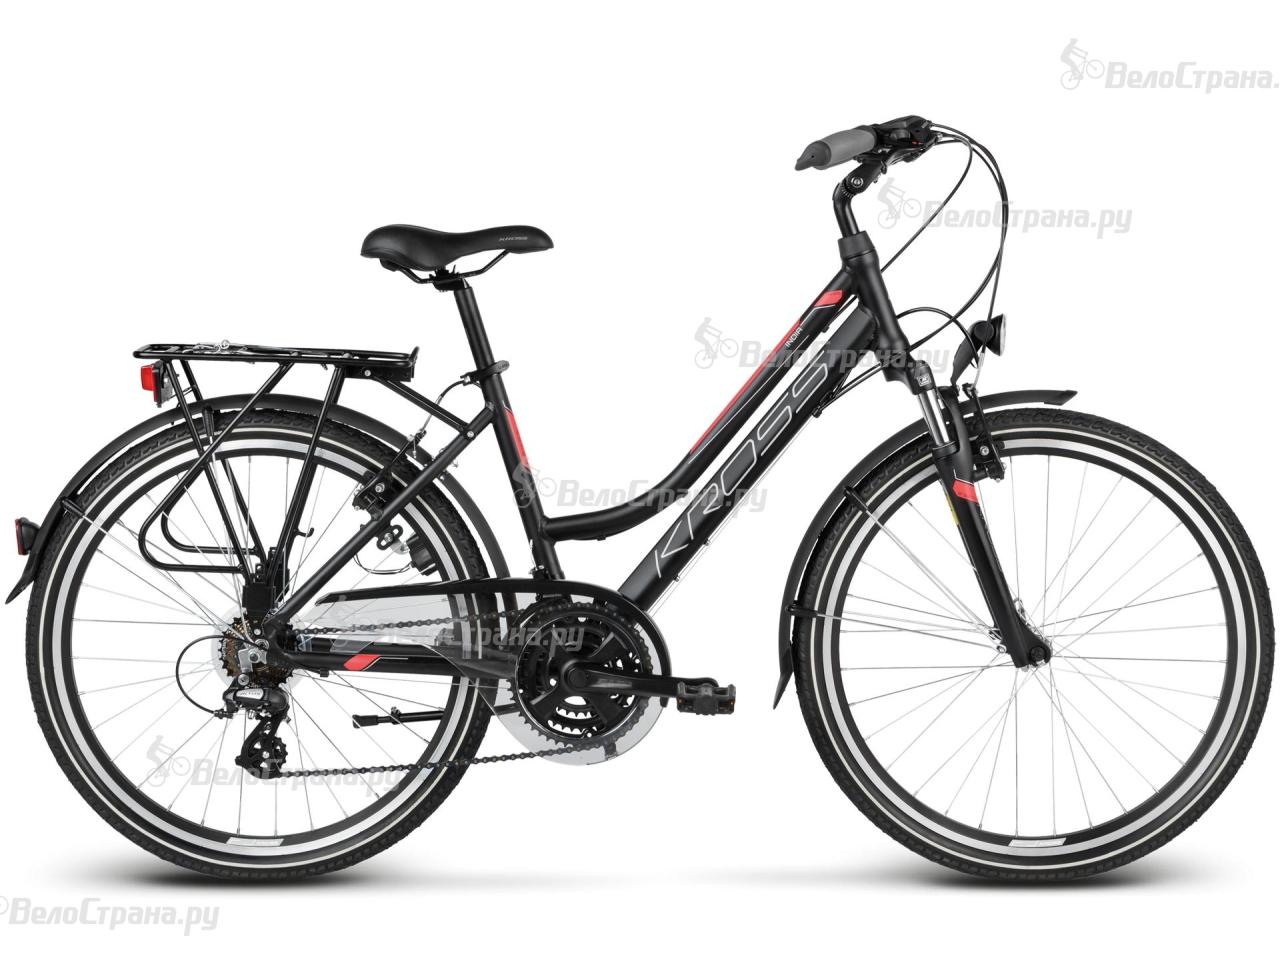 Велосипед Kross Trans India Lady (2017) buy viewsonic monitor india